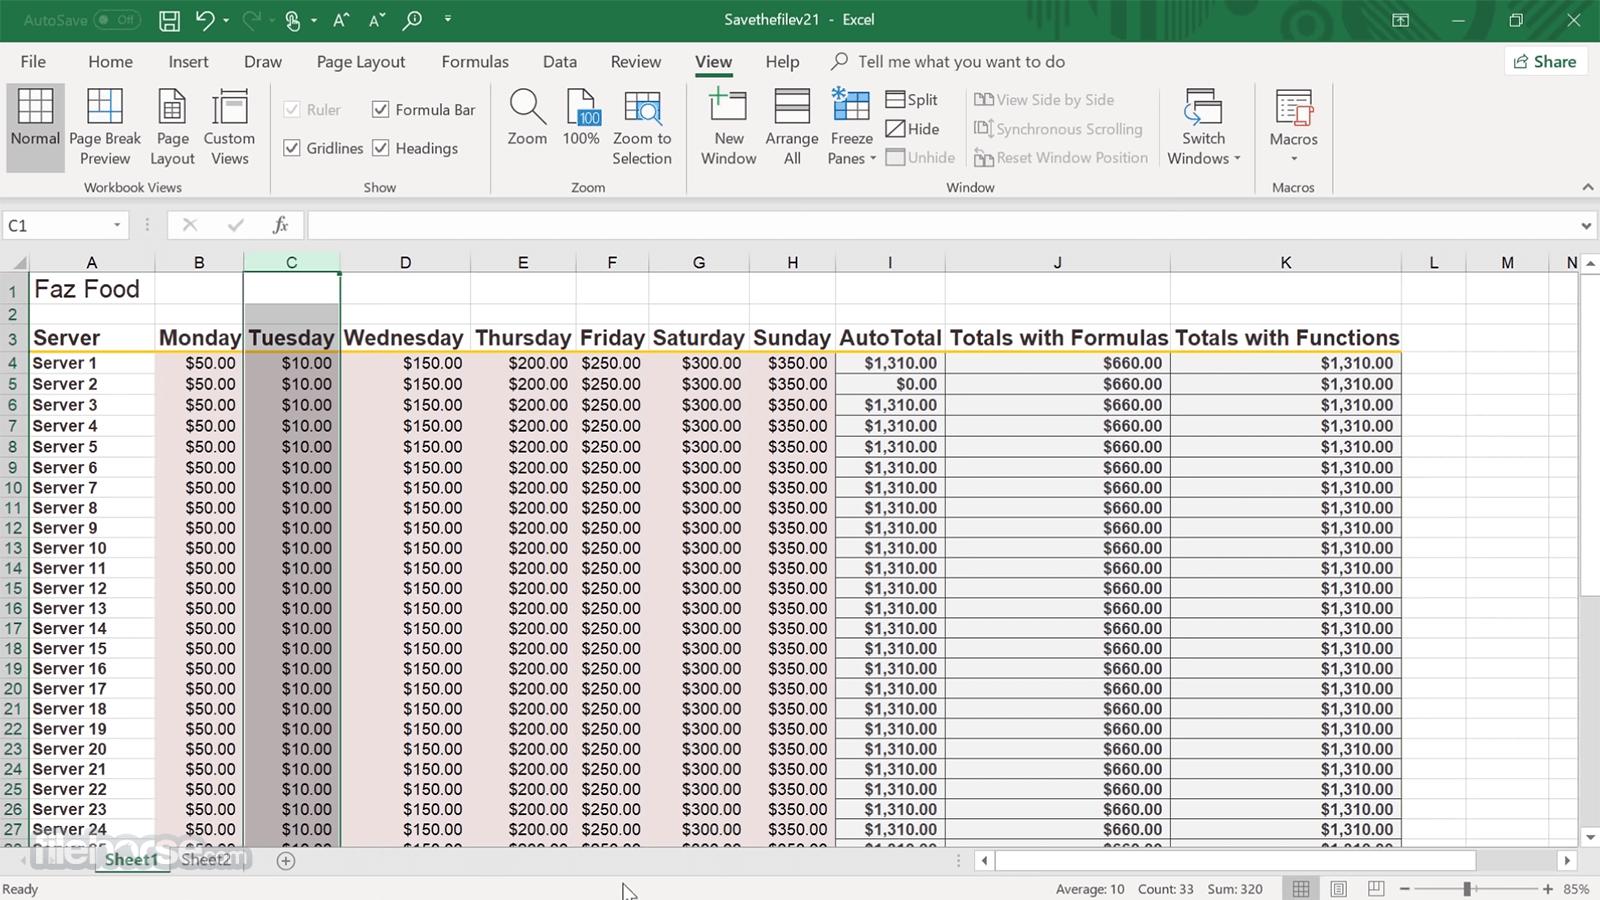 Microsoft Office 2019 Descargar (2021 Última versión) para Windows 10, 8, 7